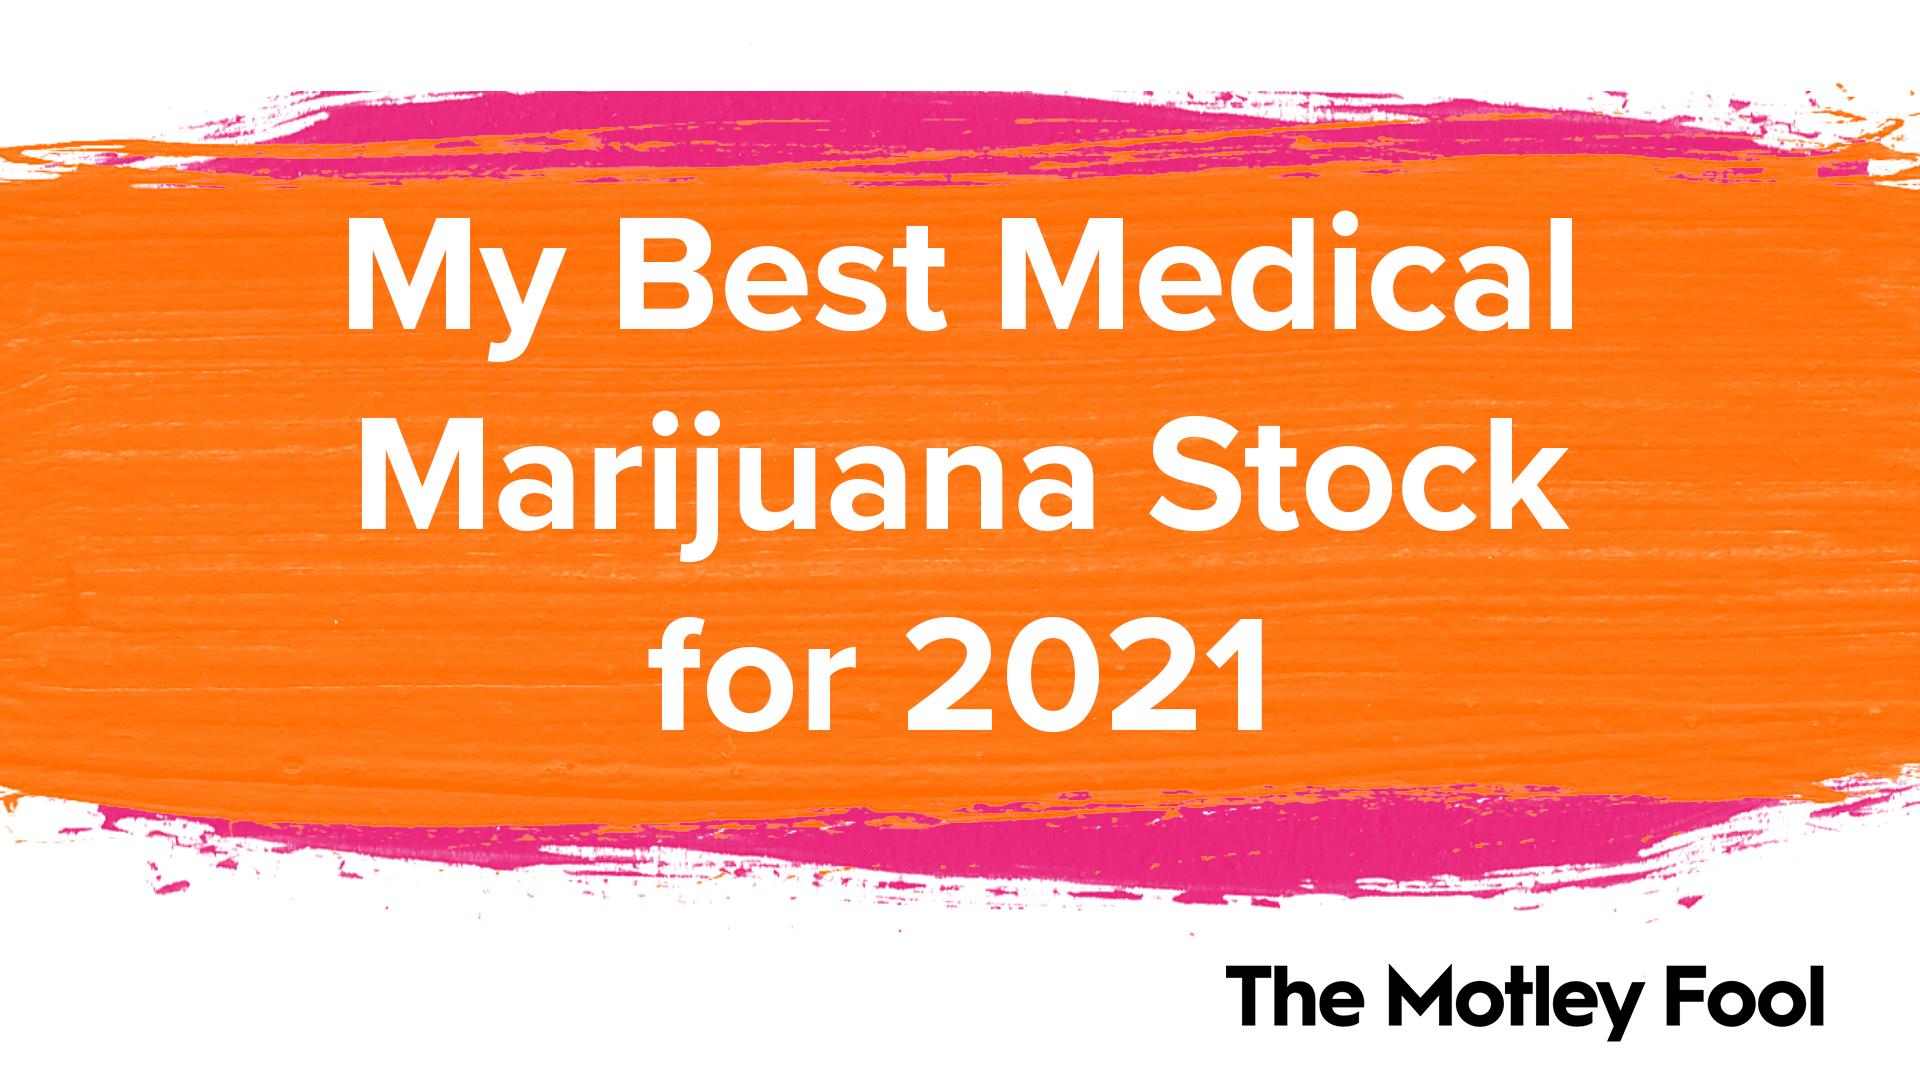 My Best Medical Marijuana Stock for 2021